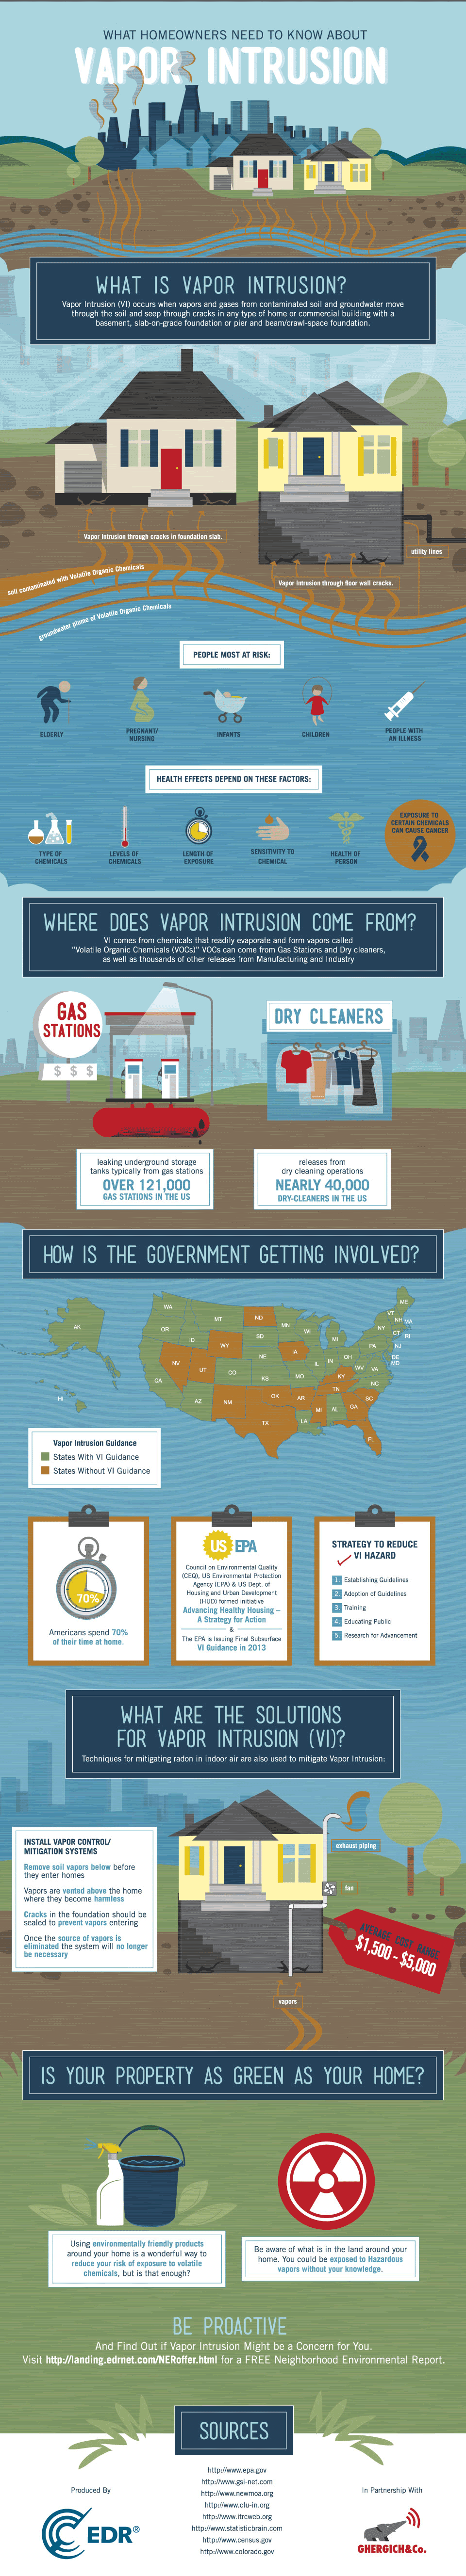 VOC Home Invasion-Infographic